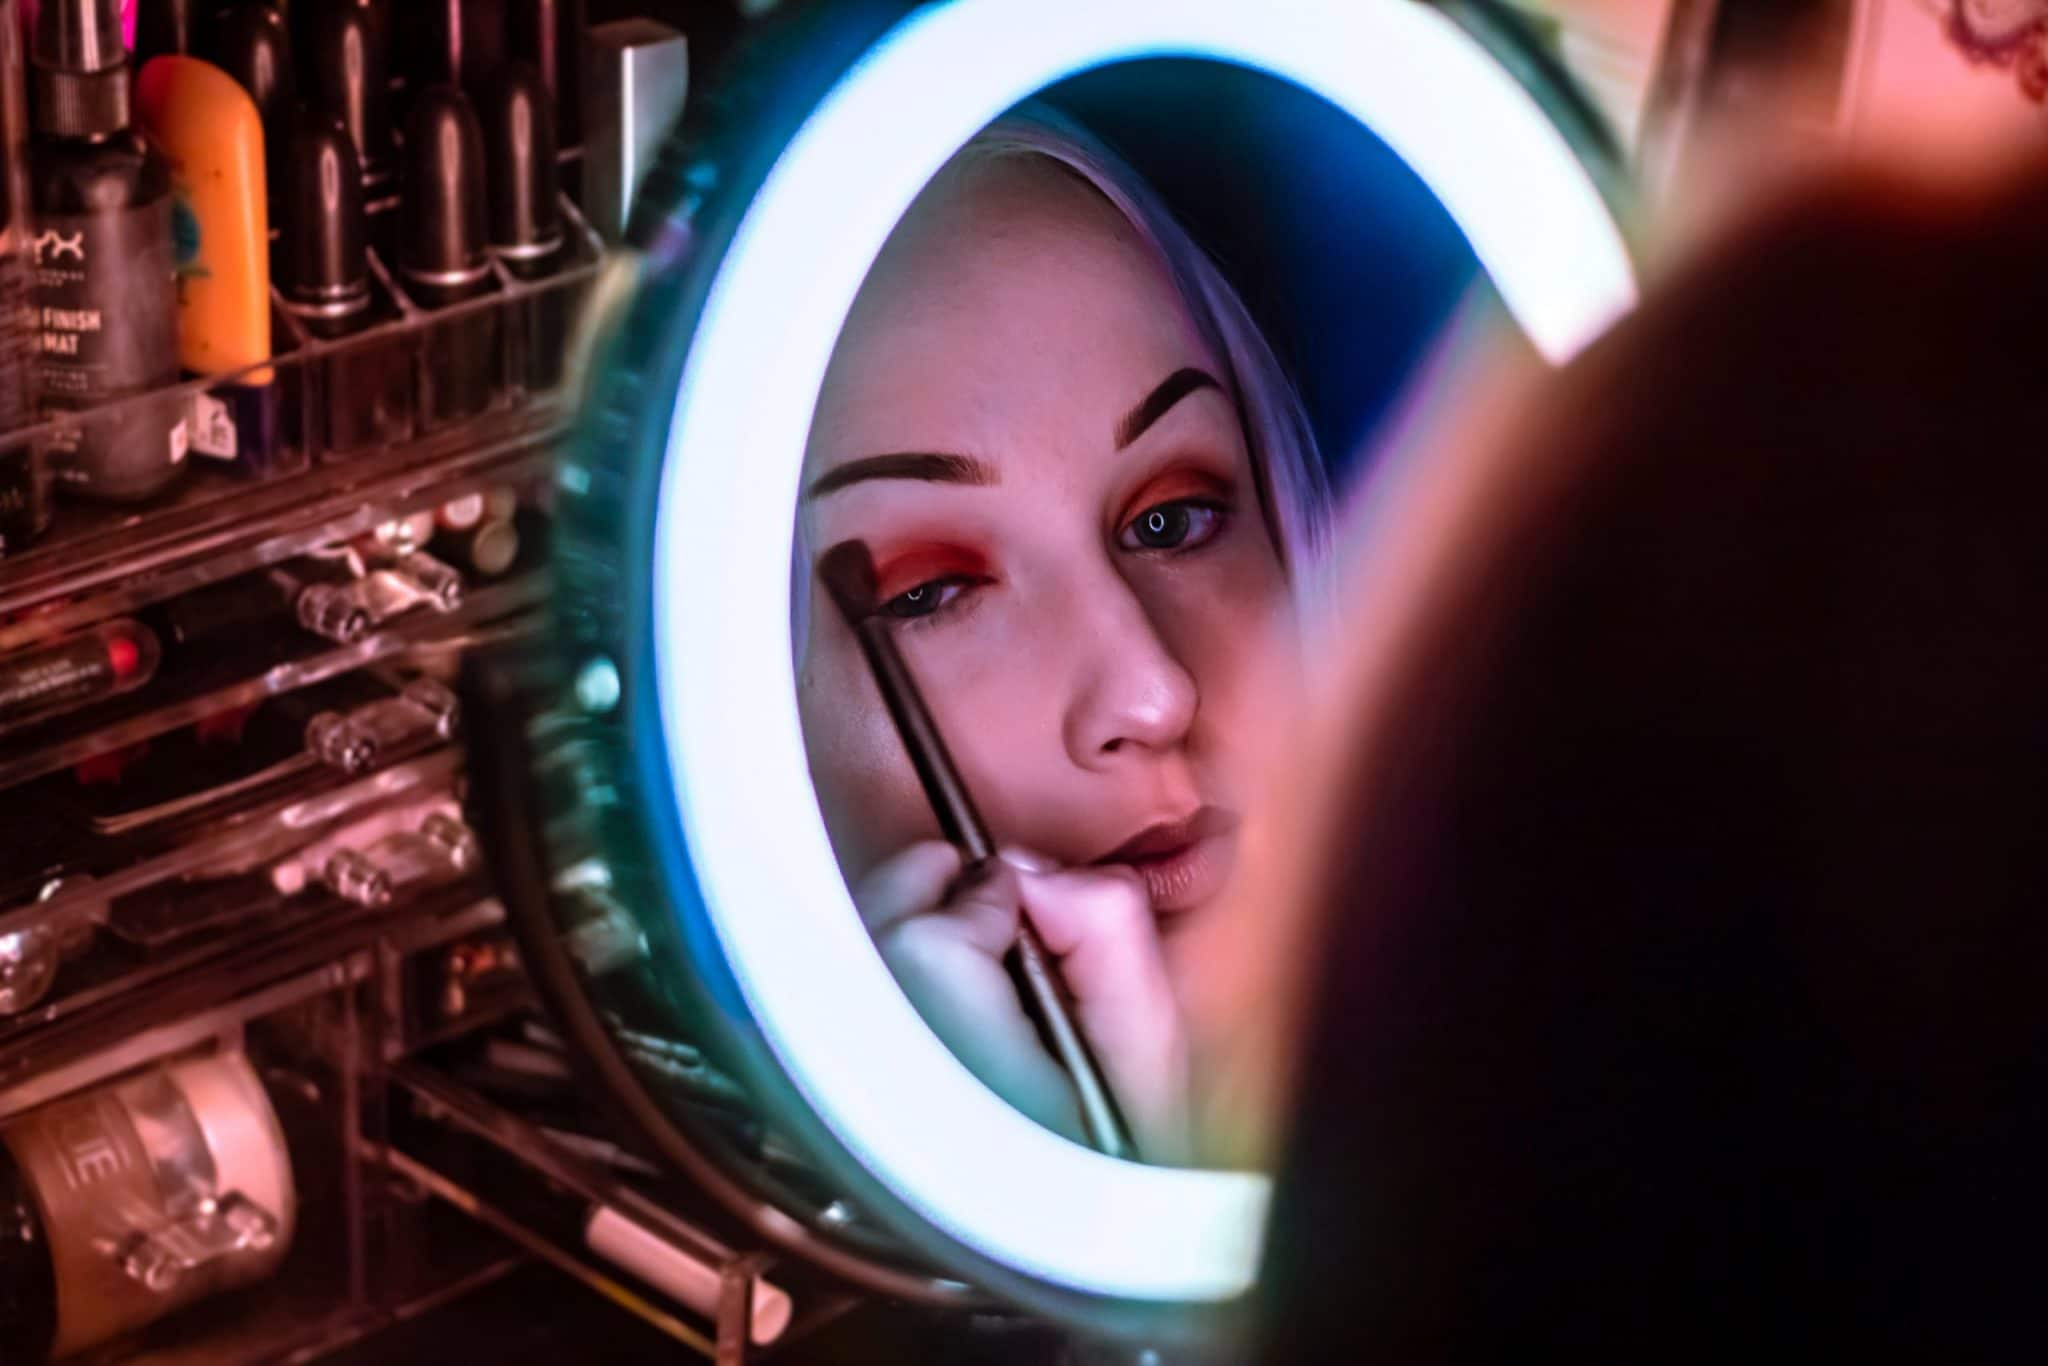 Makeup Cosmetic Mirror Mascara